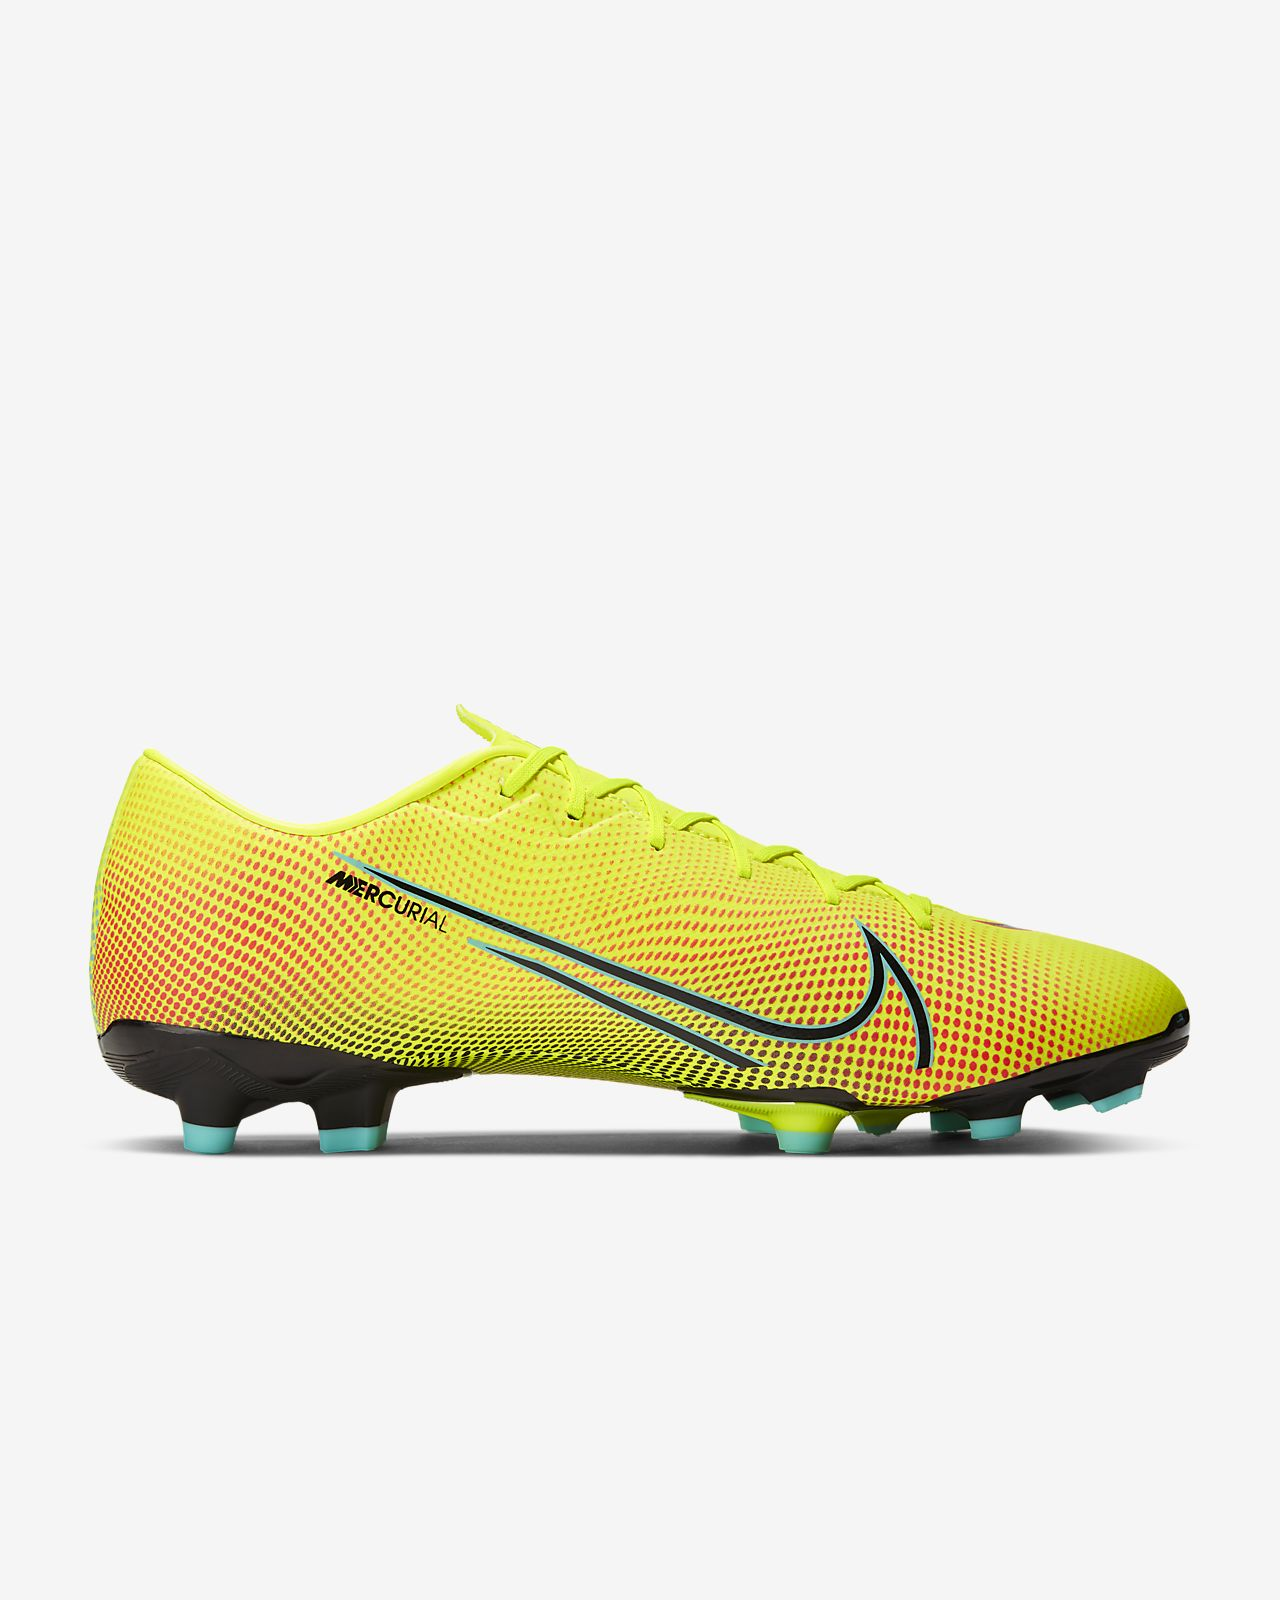 Nike Mercurial Vapor 13 Academy TF Soccer Cleat Black